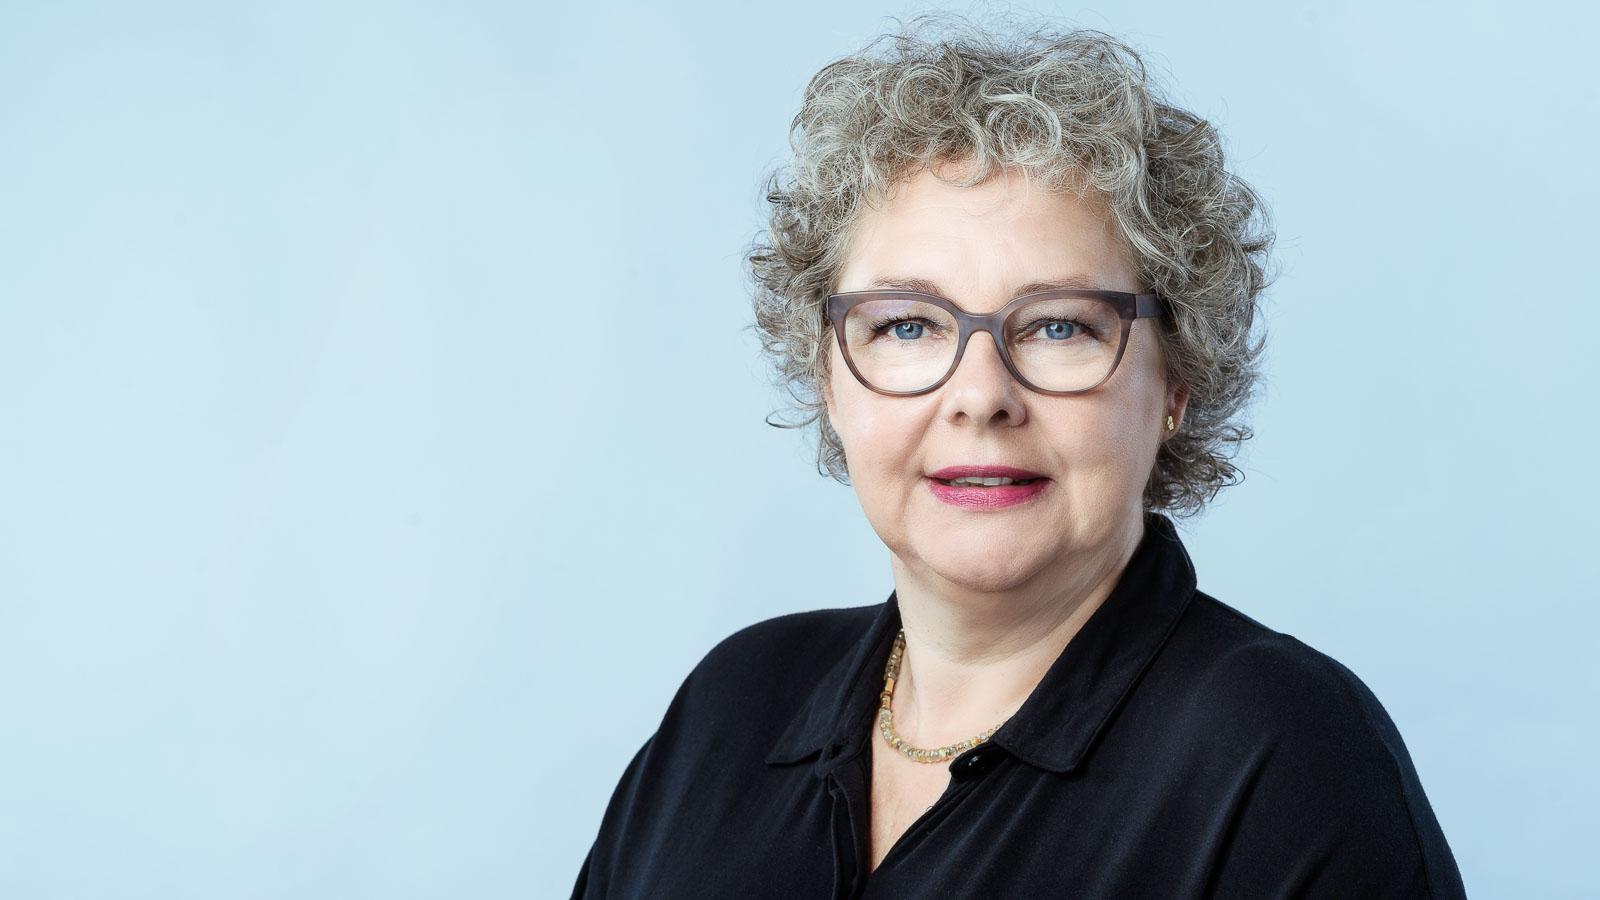 Carole Reist